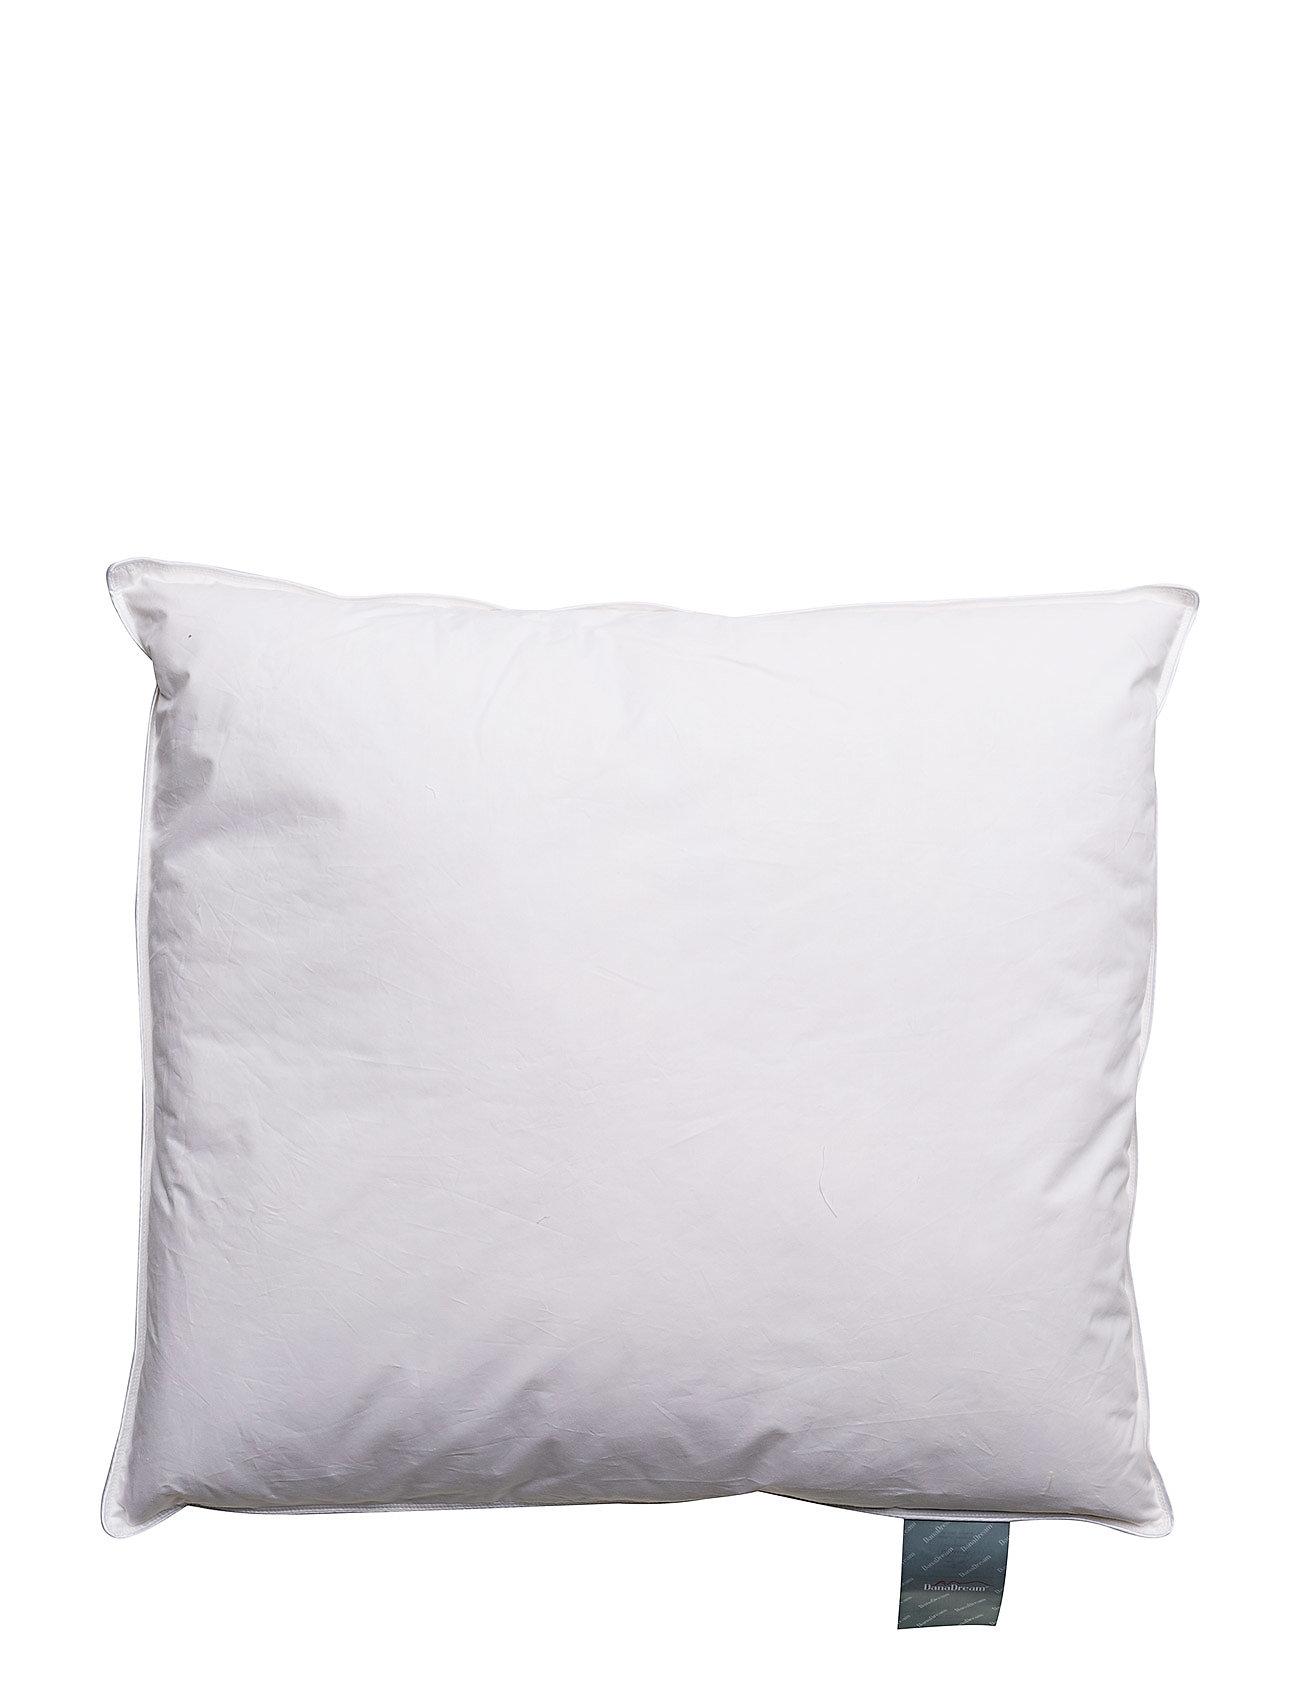 danadream classic low pillow white 529 kr quilts of denmark. Black Bedroom Furniture Sets. Home Design Ideas